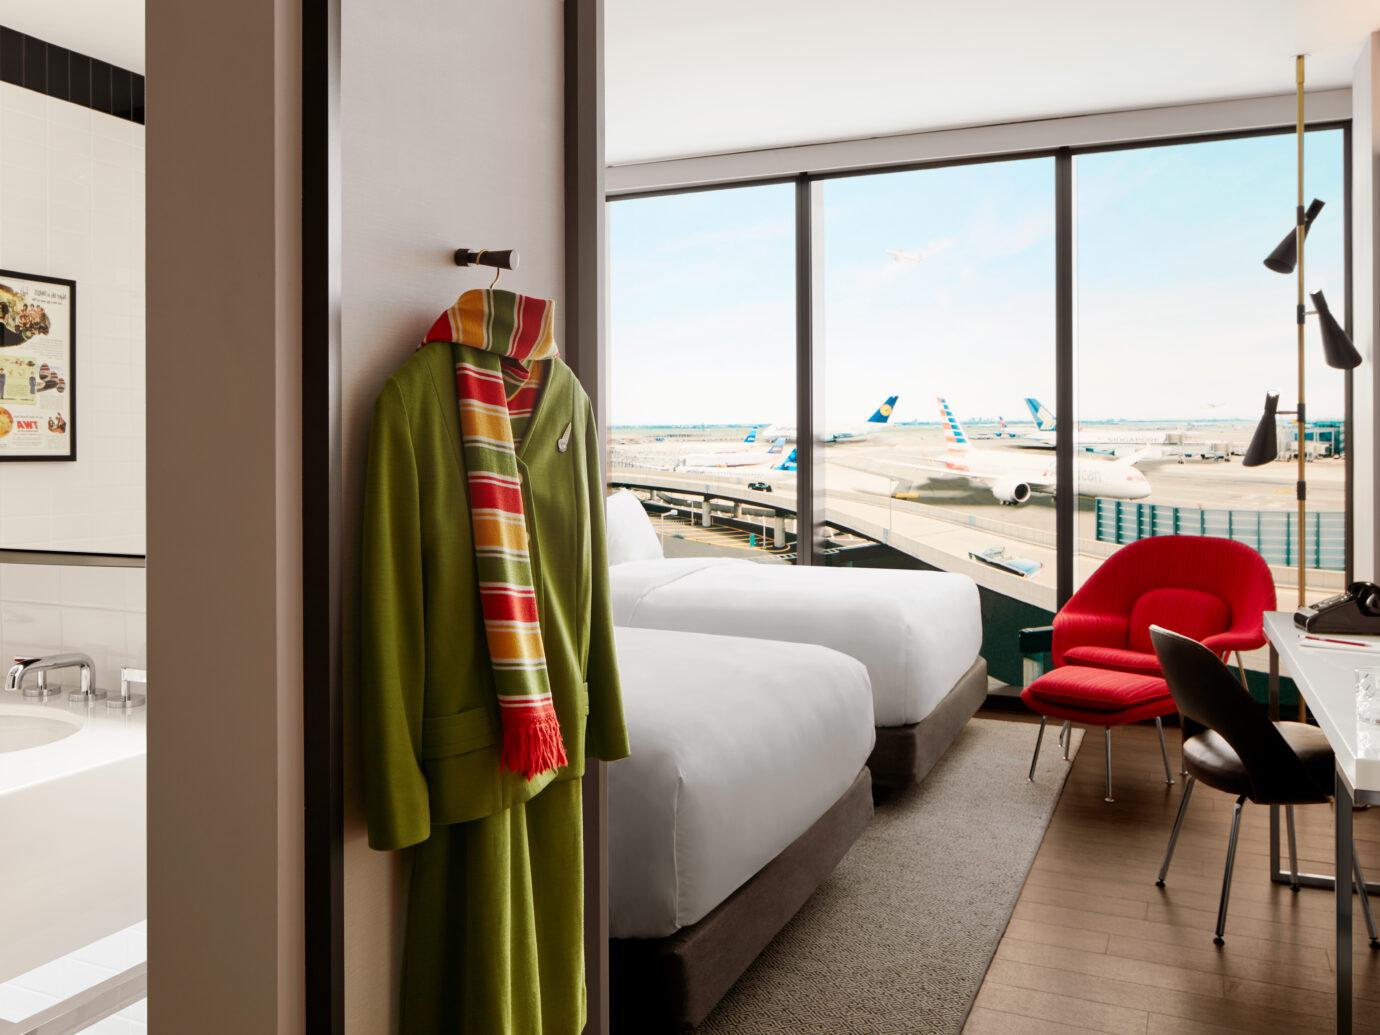 TWA Hotel Guest Room